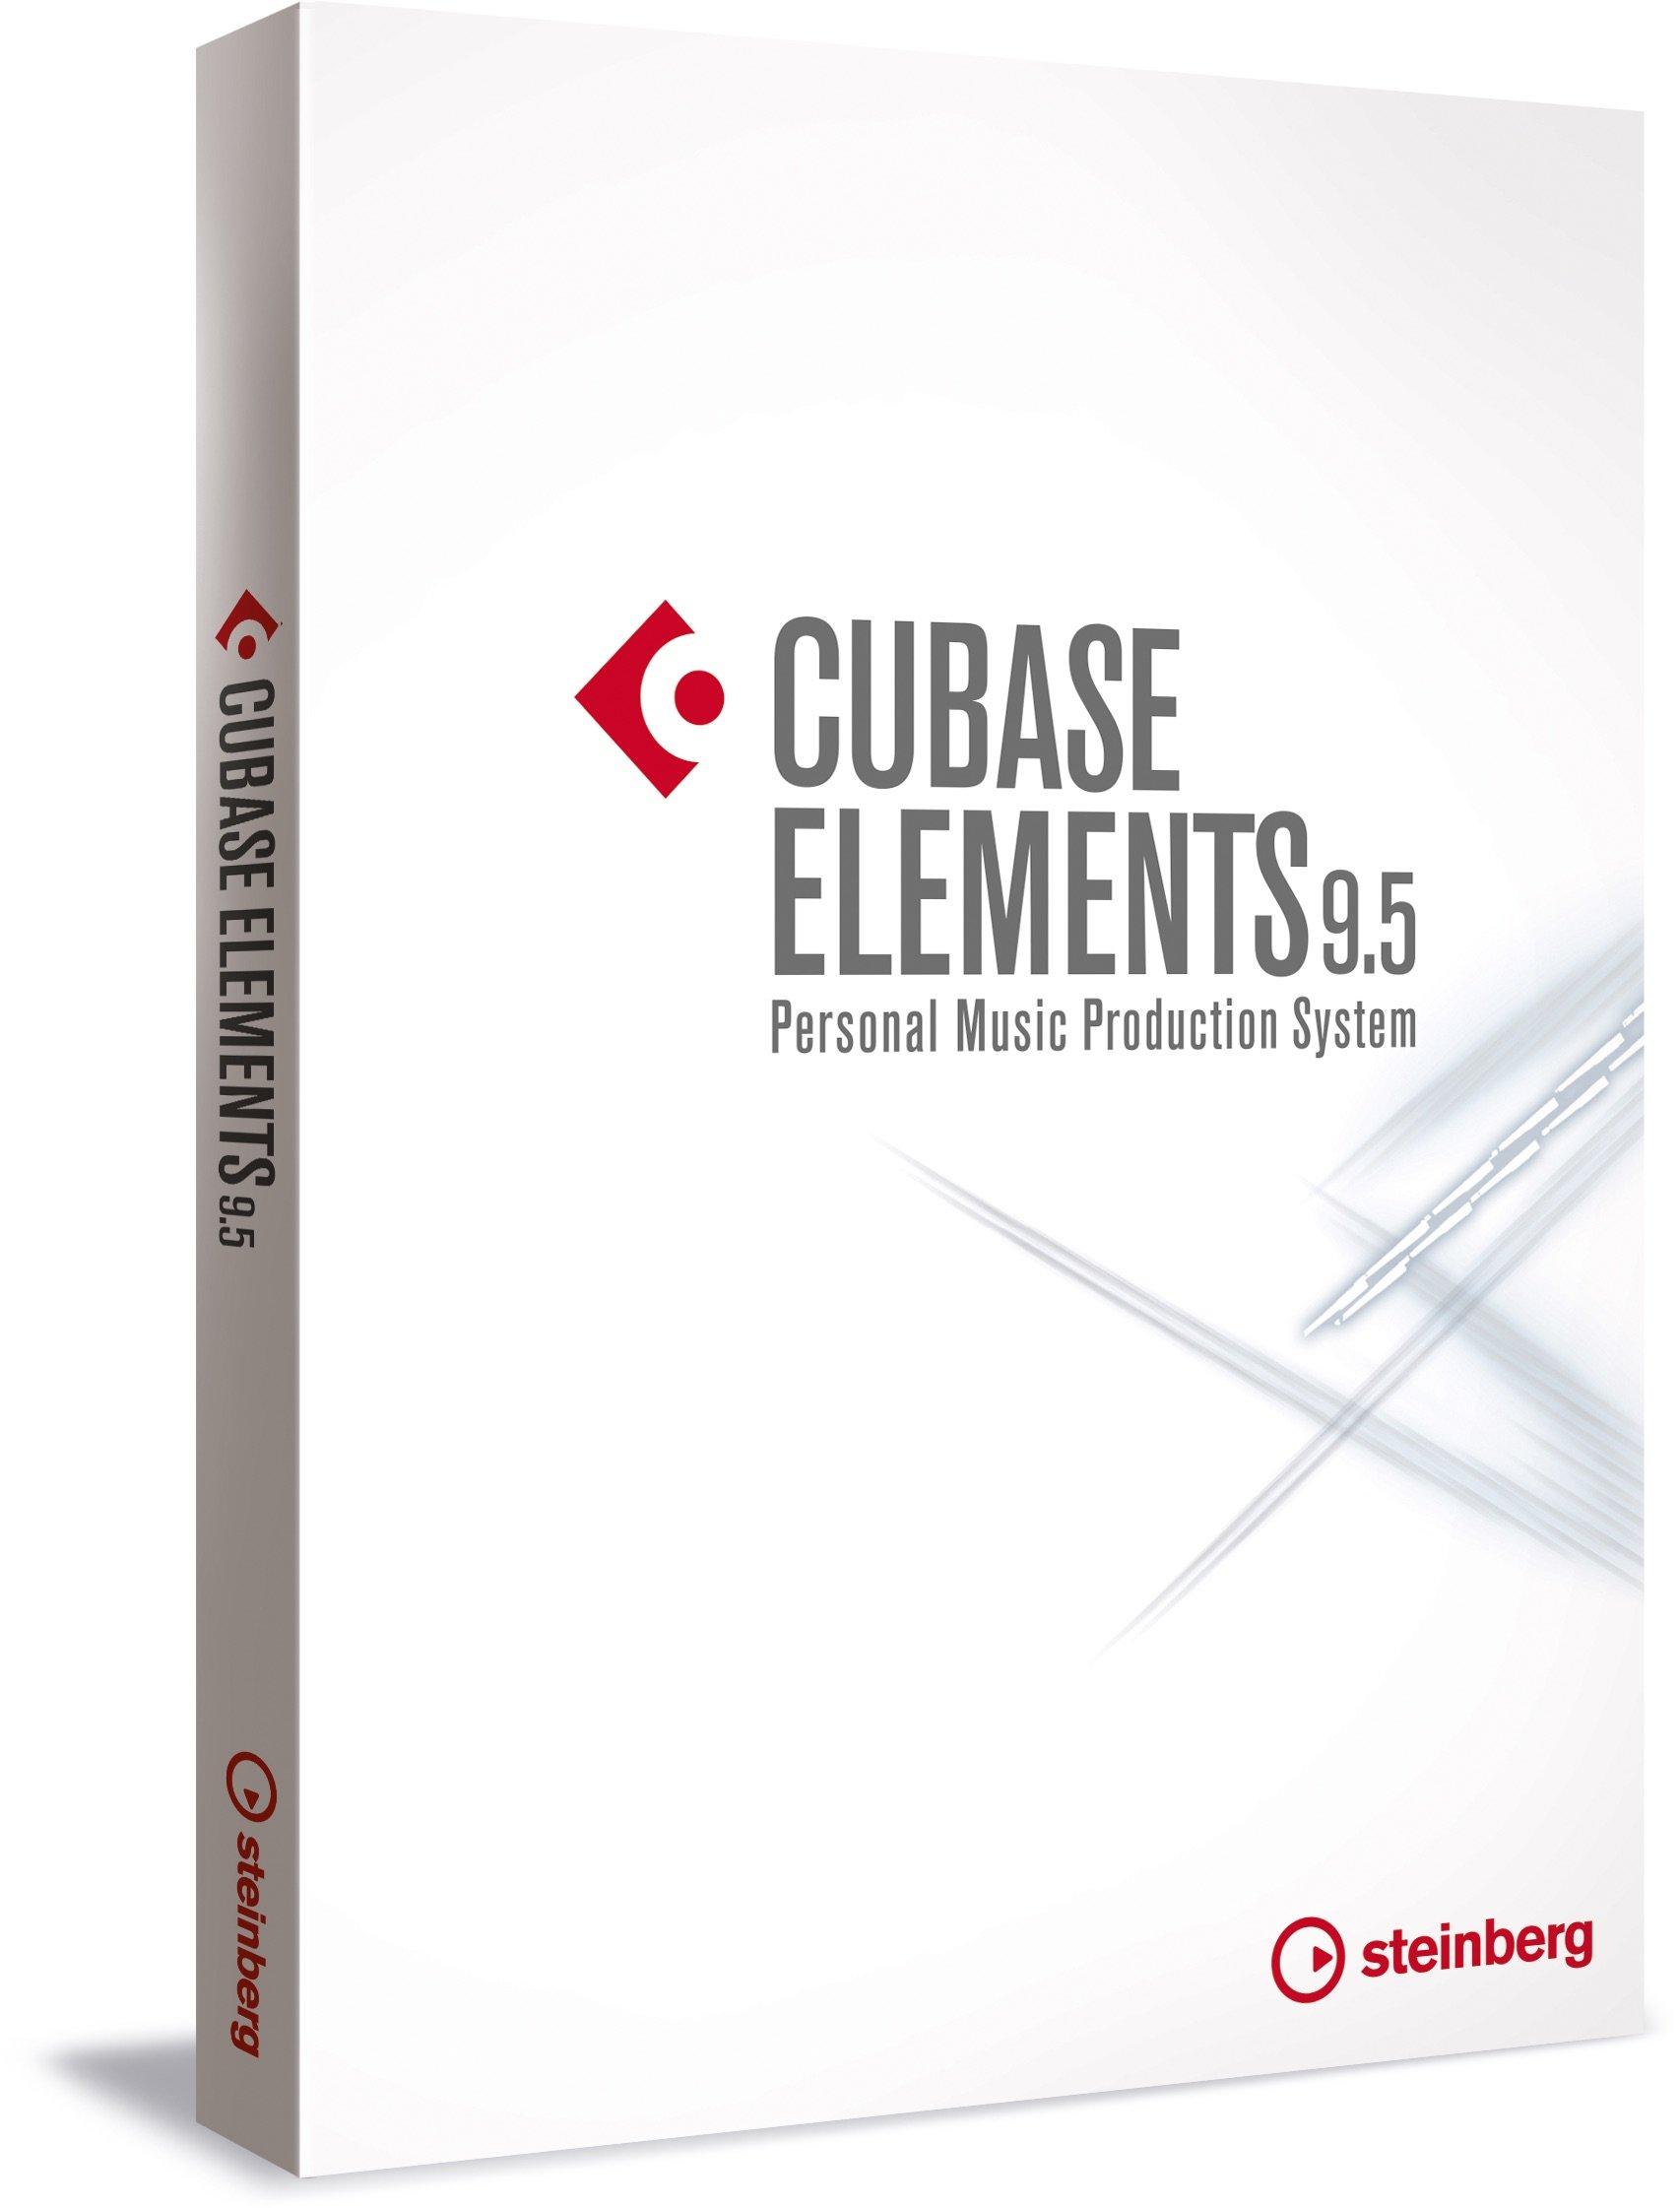 cubase elements 10 free download